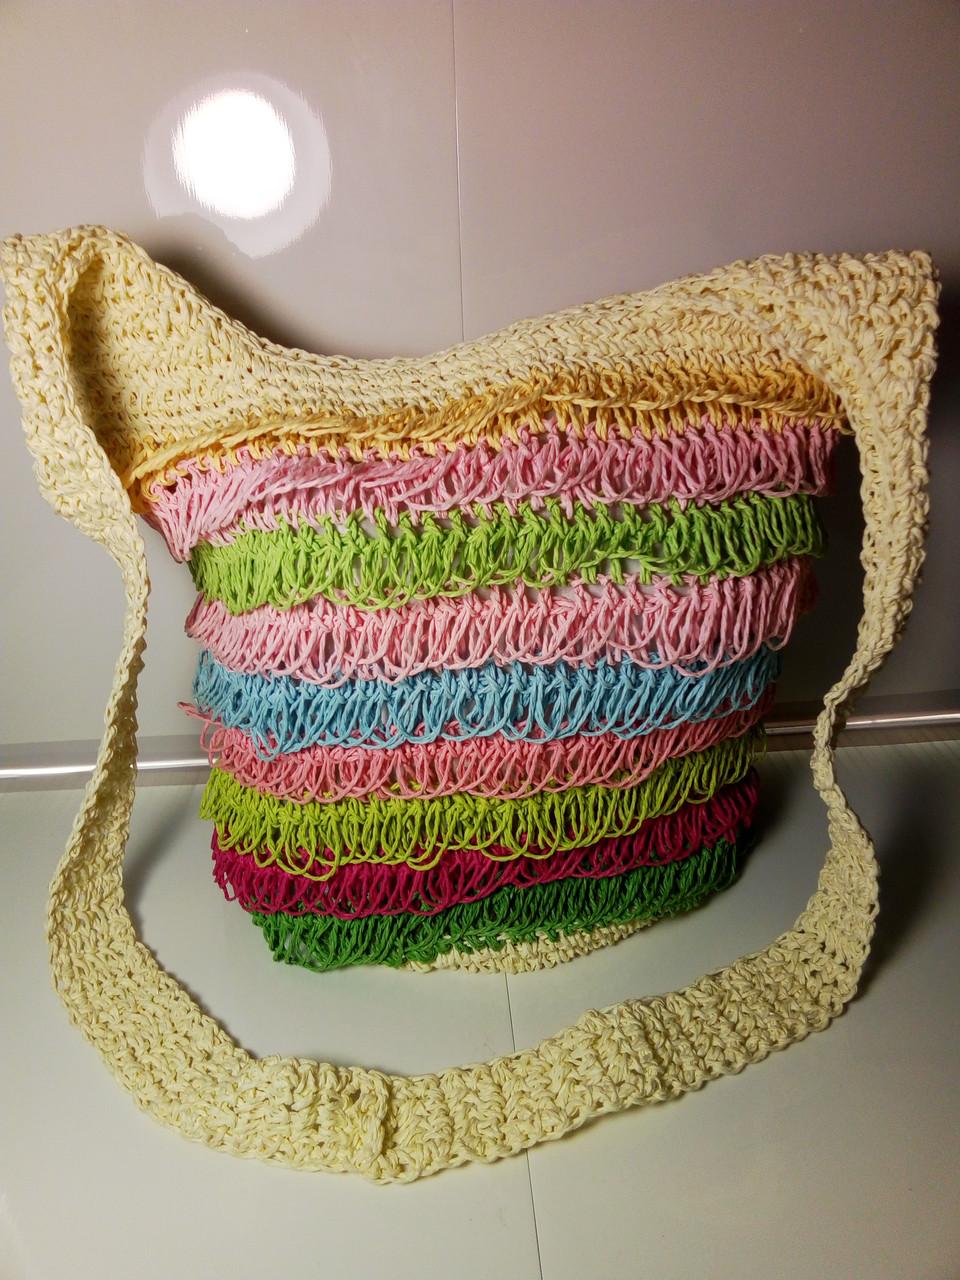 Пляжная цветная женская сумка